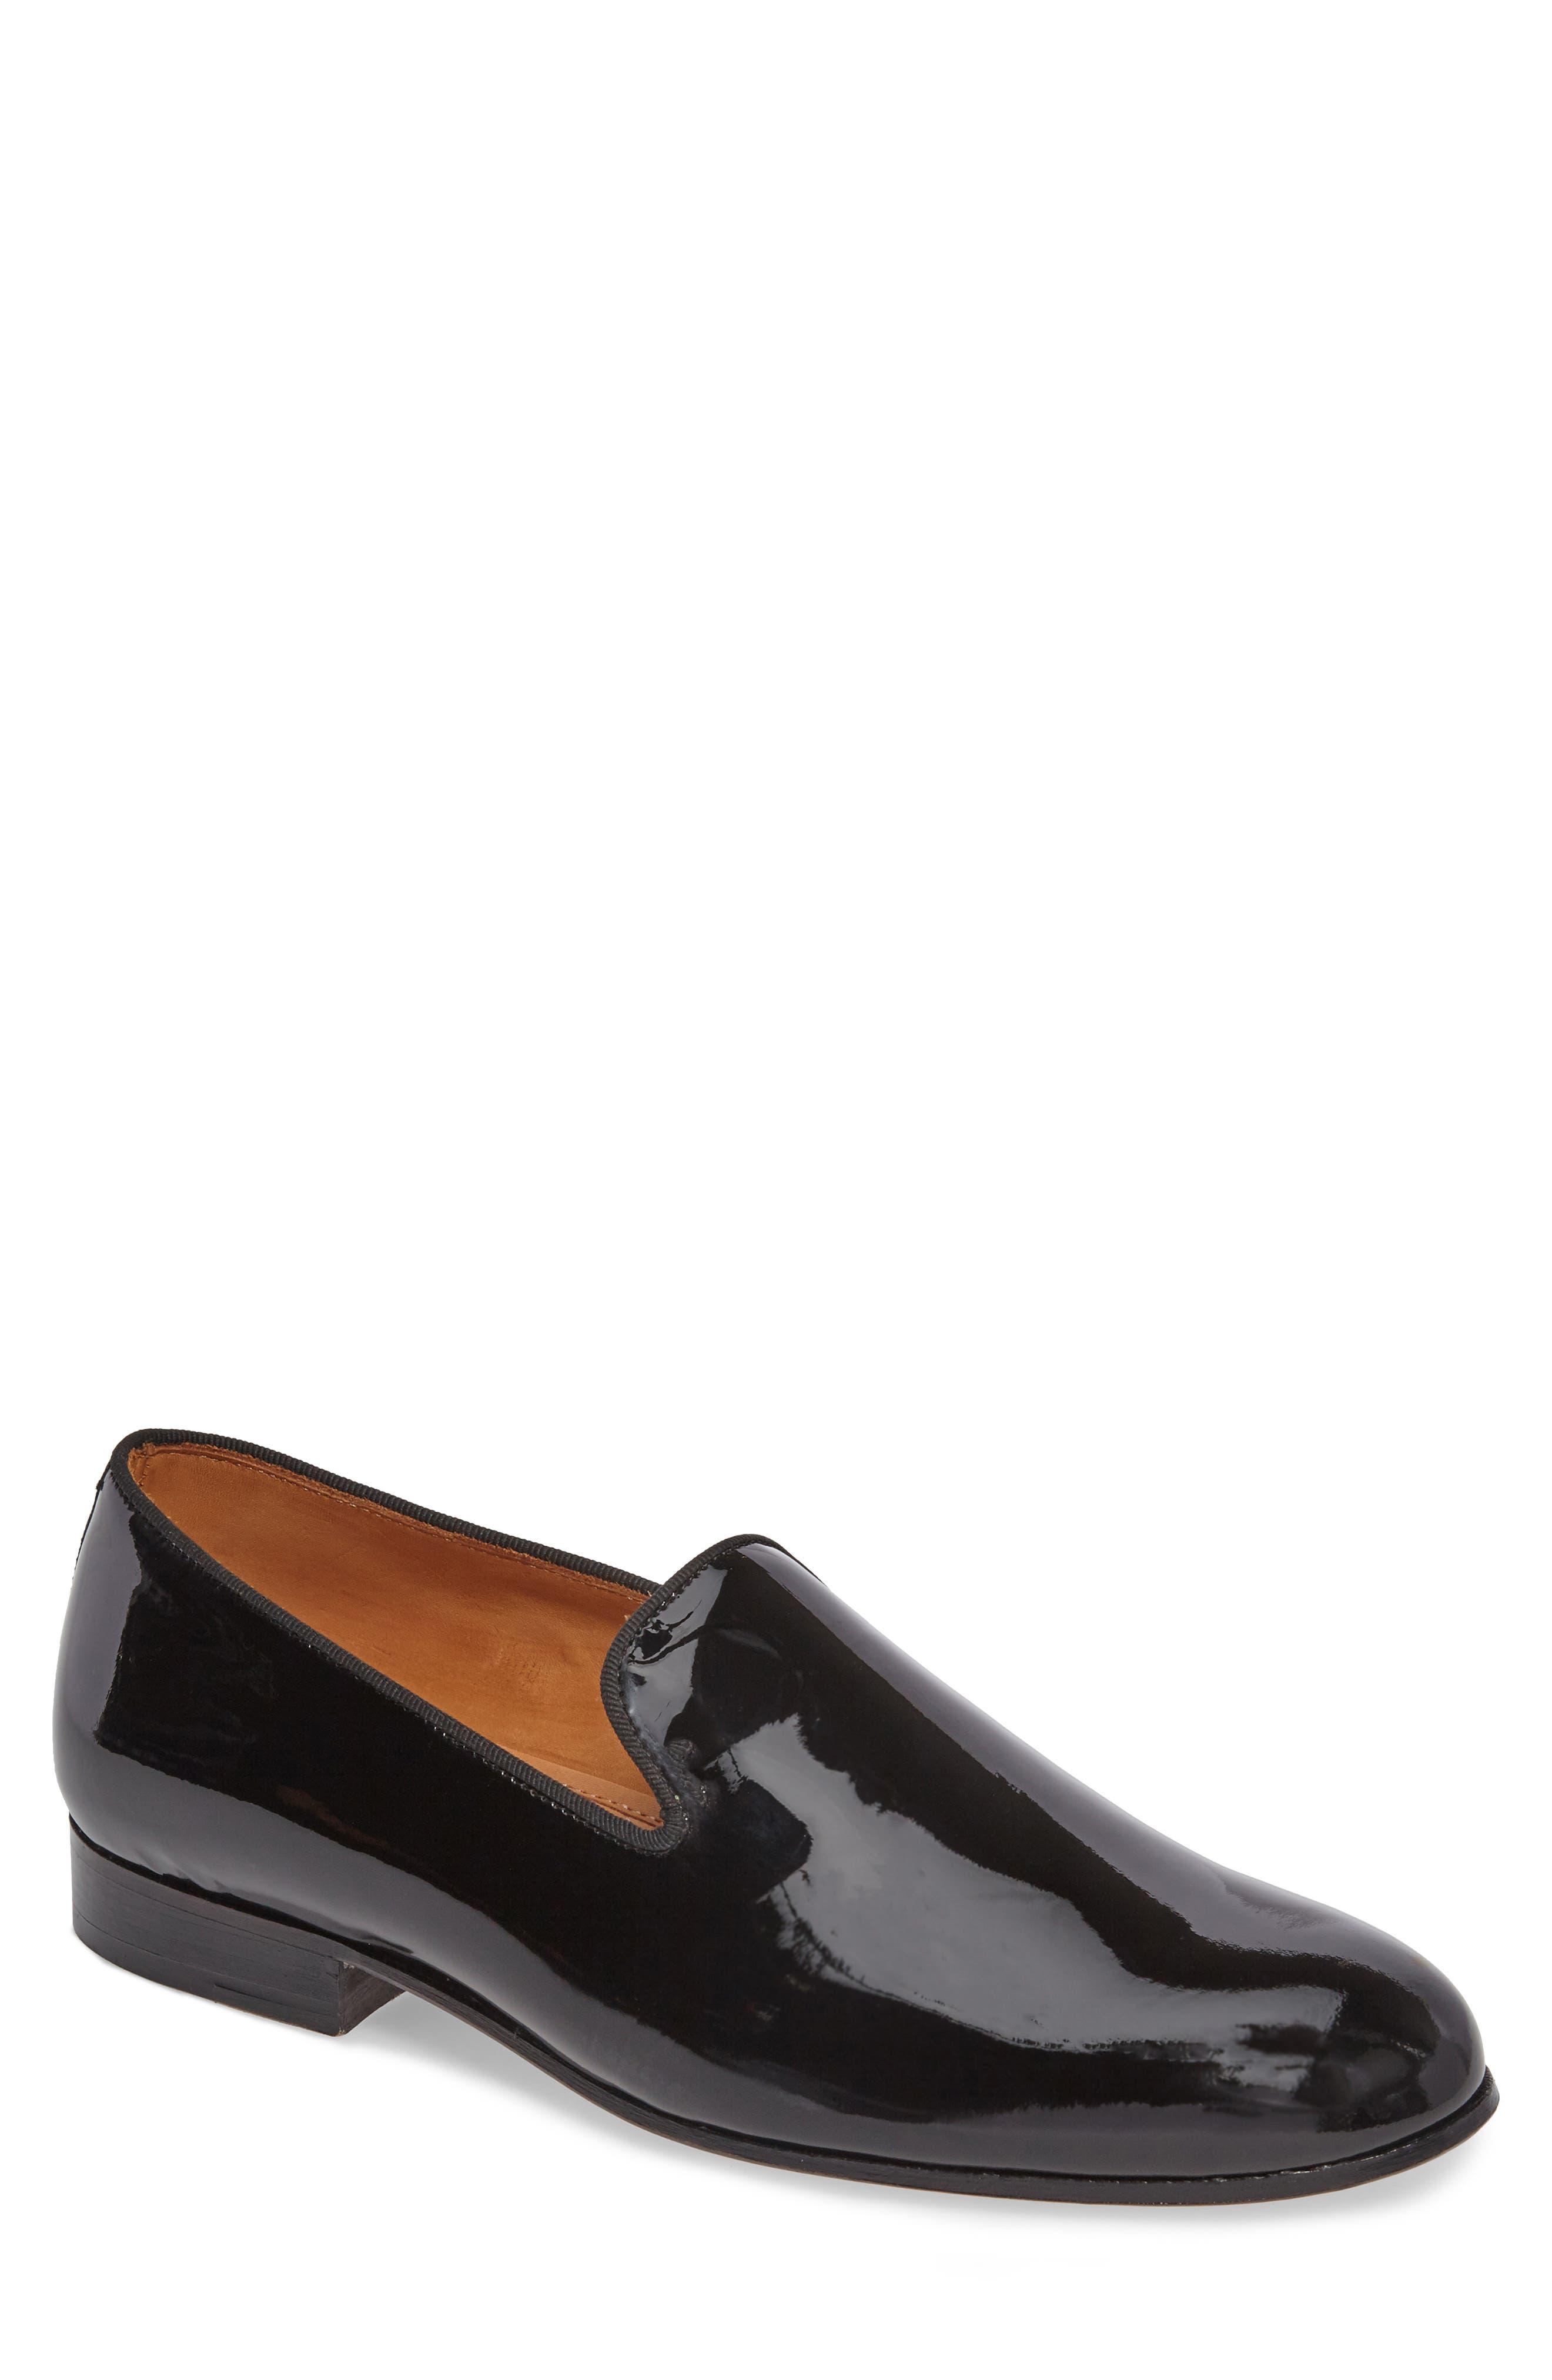 Bravi Loafer,                         Main,                         color, Black Patent Leather